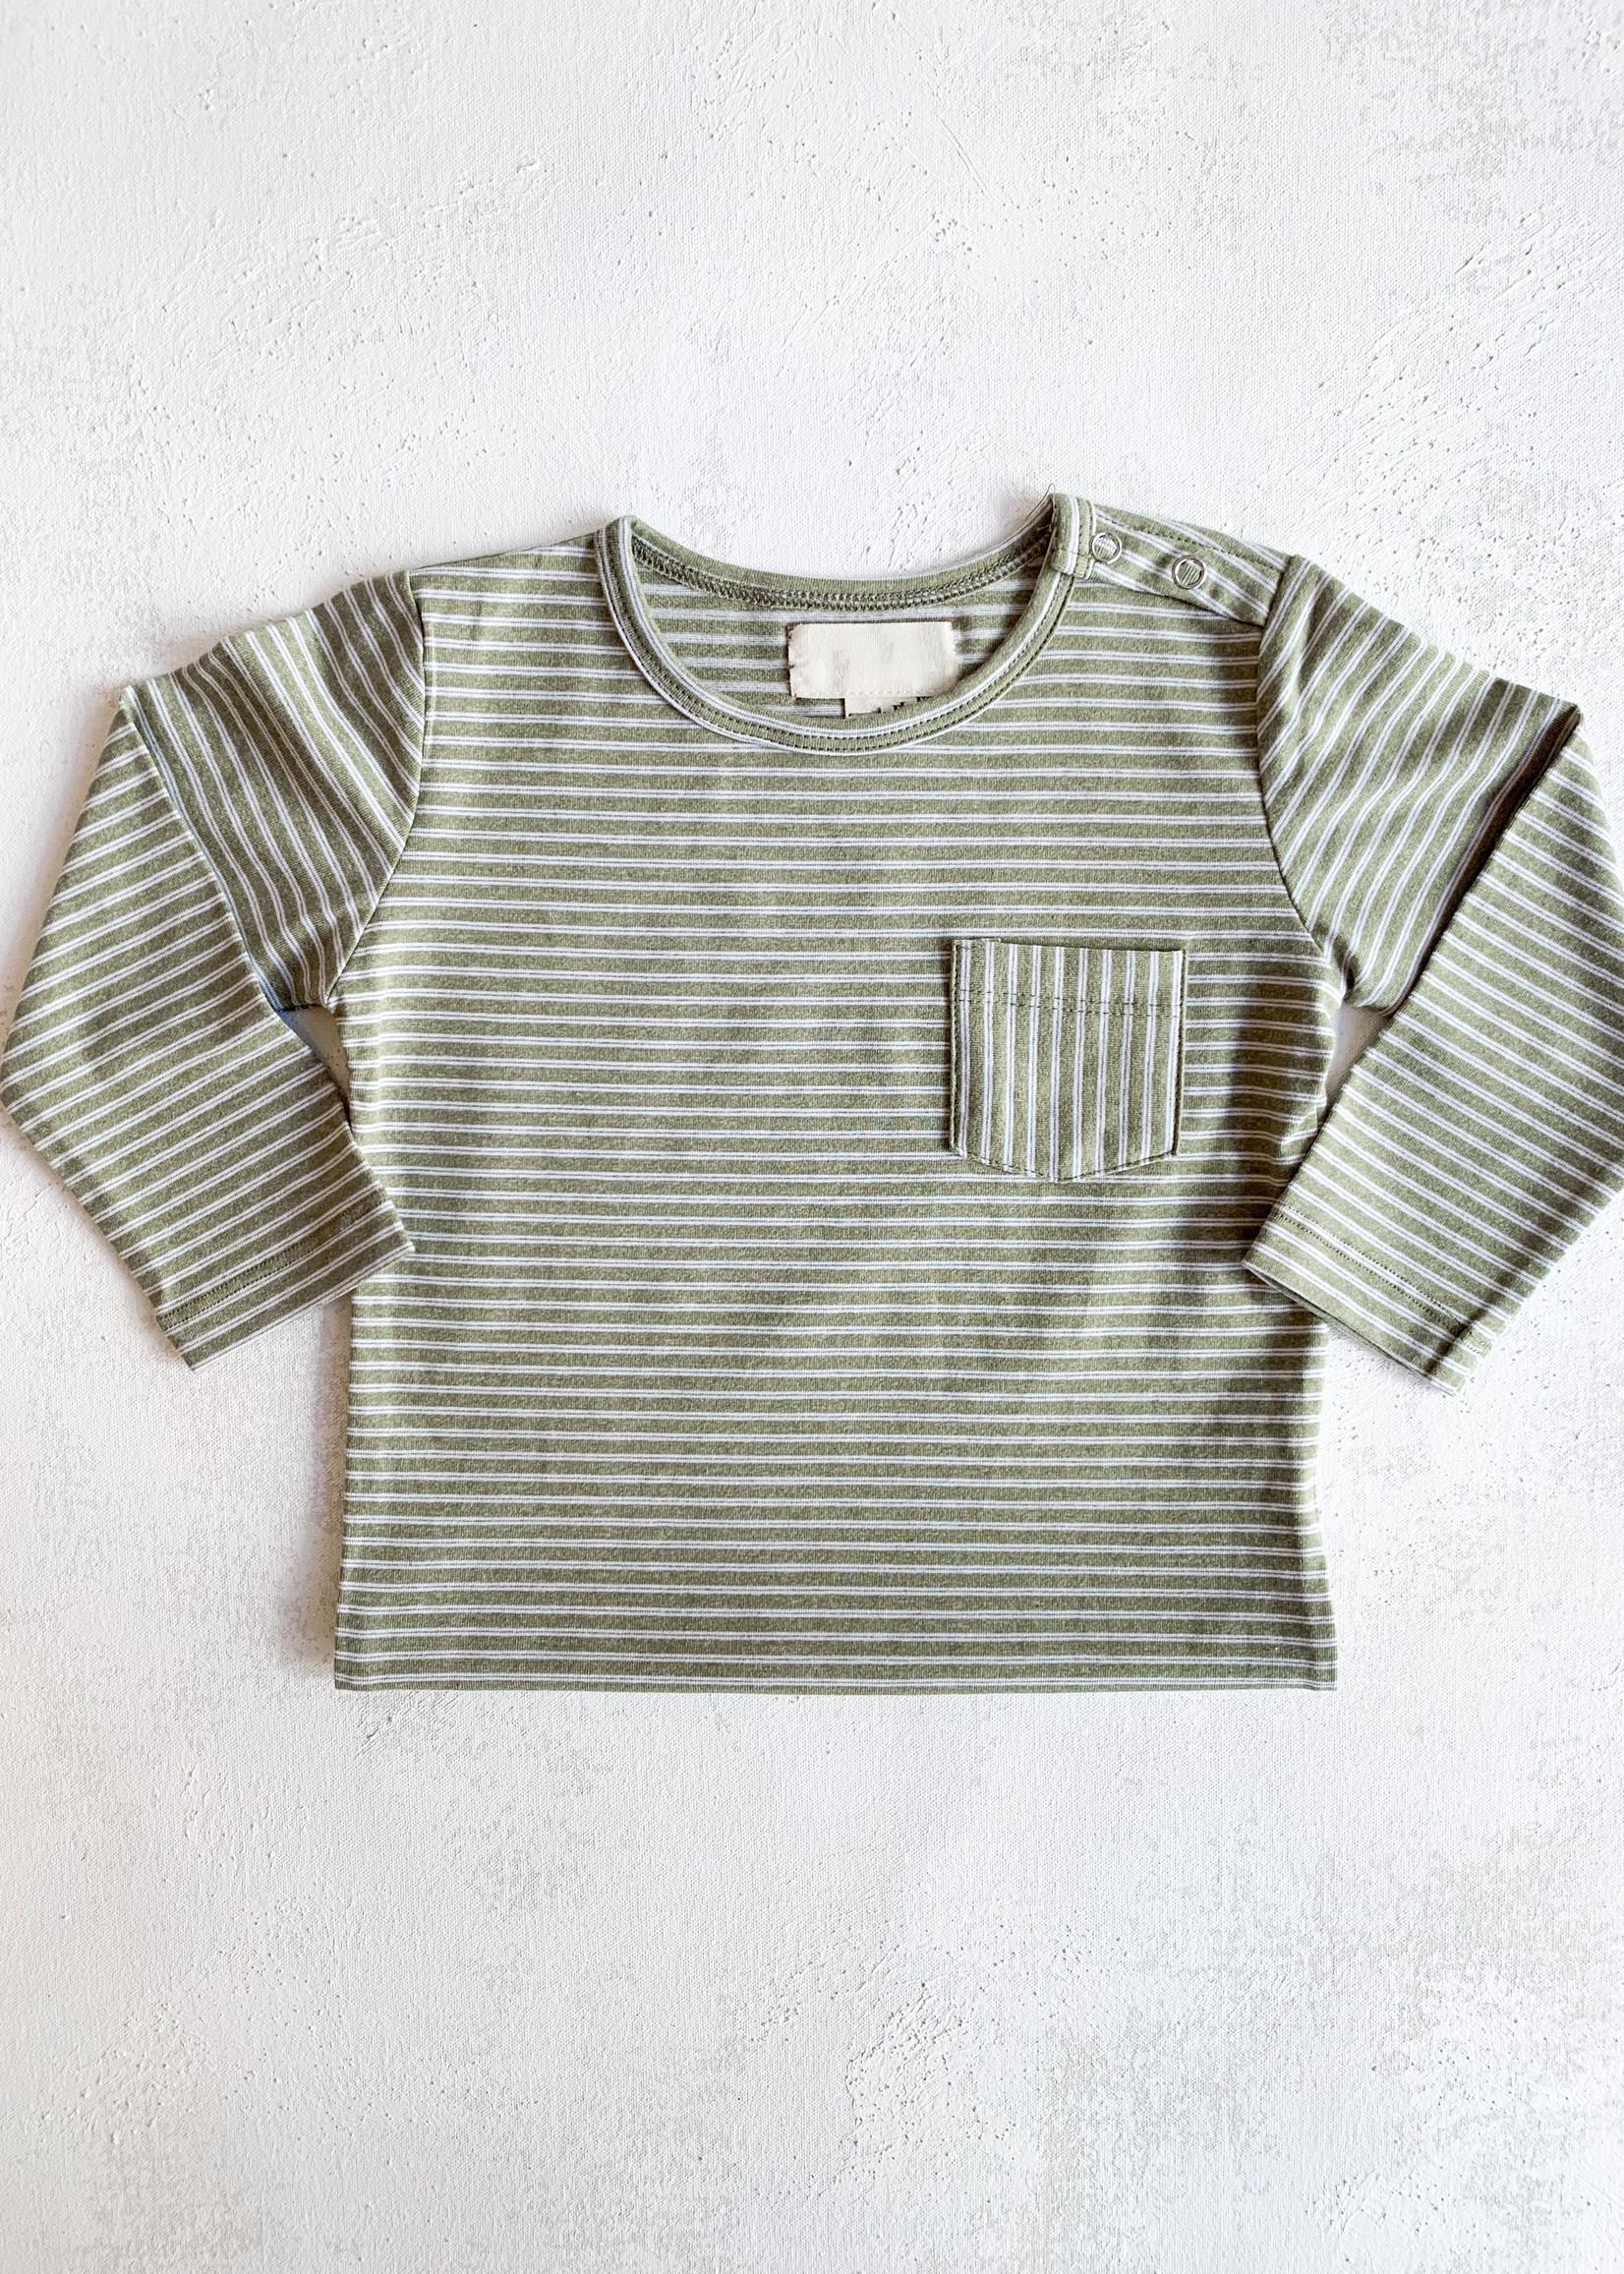 Elitaire Petite Classic Striped Onesie in Olive